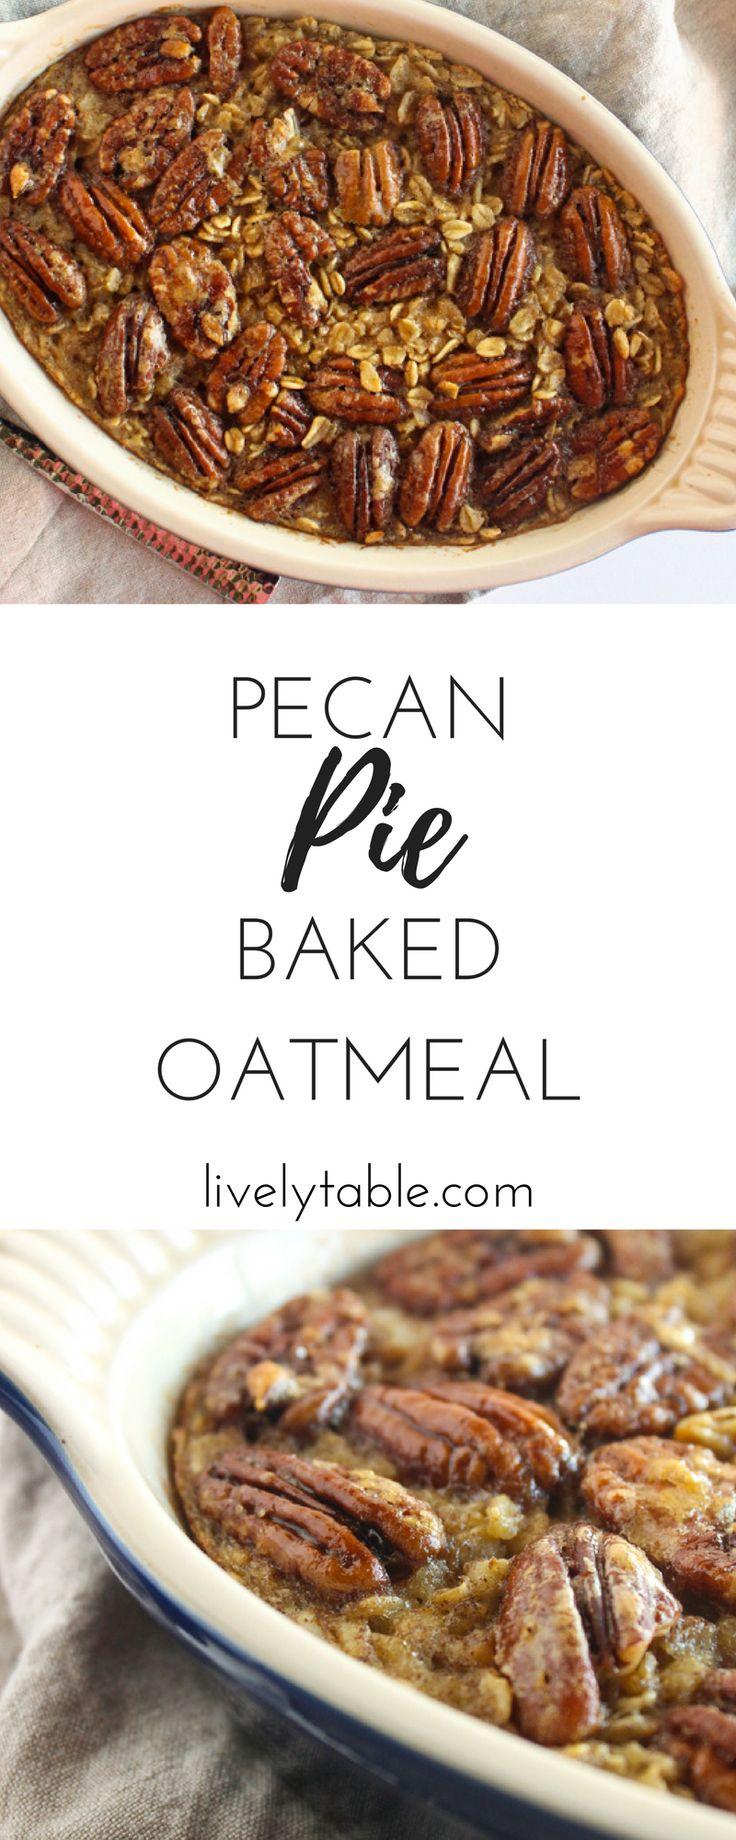 Pecan Pie Baked Oatmeal